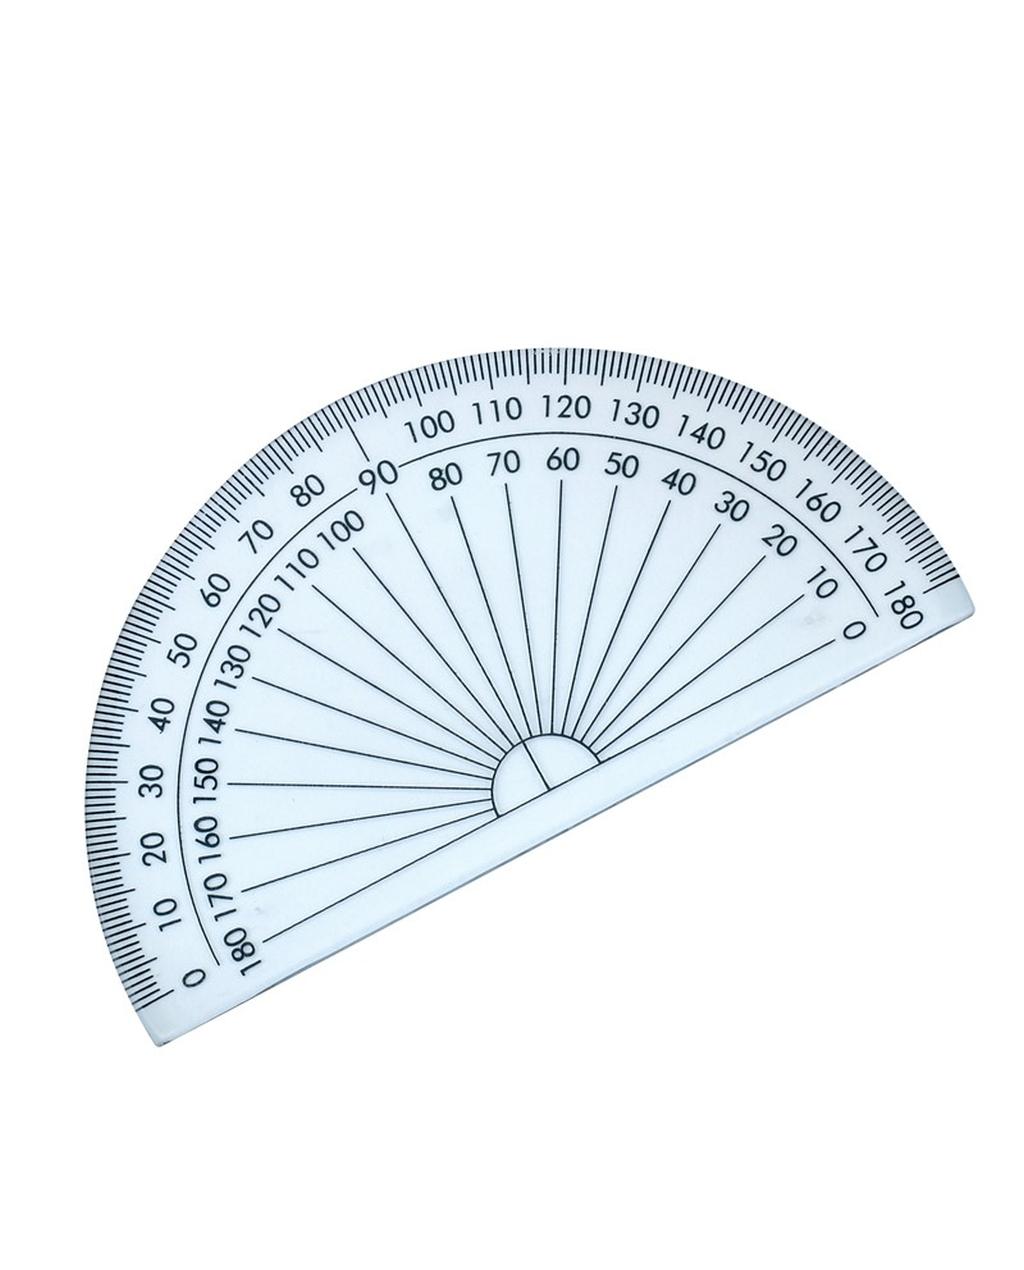 100mm Semi-Circular Protractor